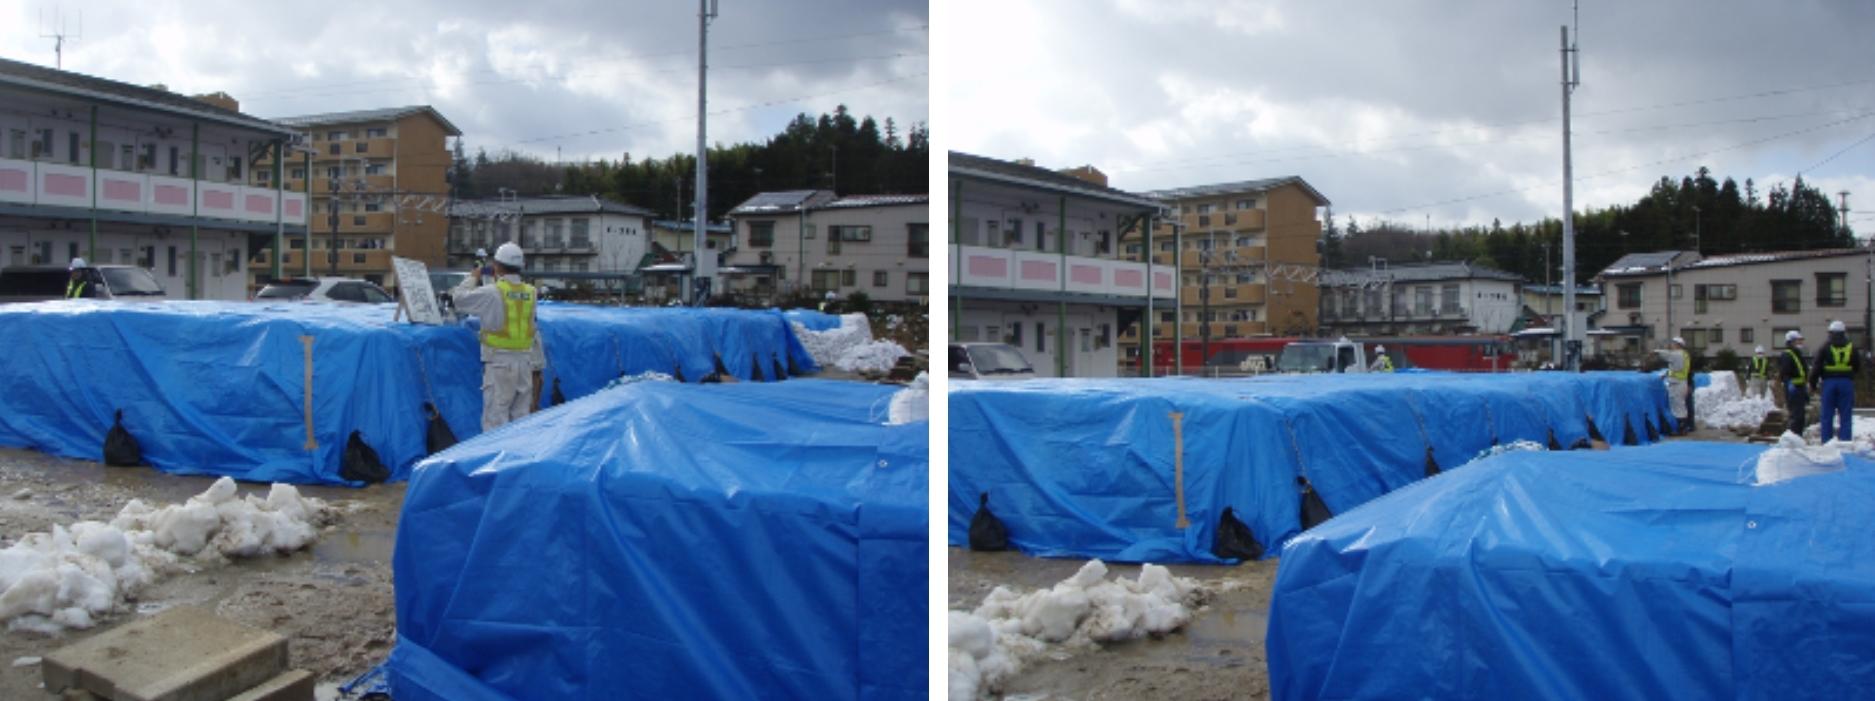 fukushima-soundscapes-koji-nagahata-241213bis